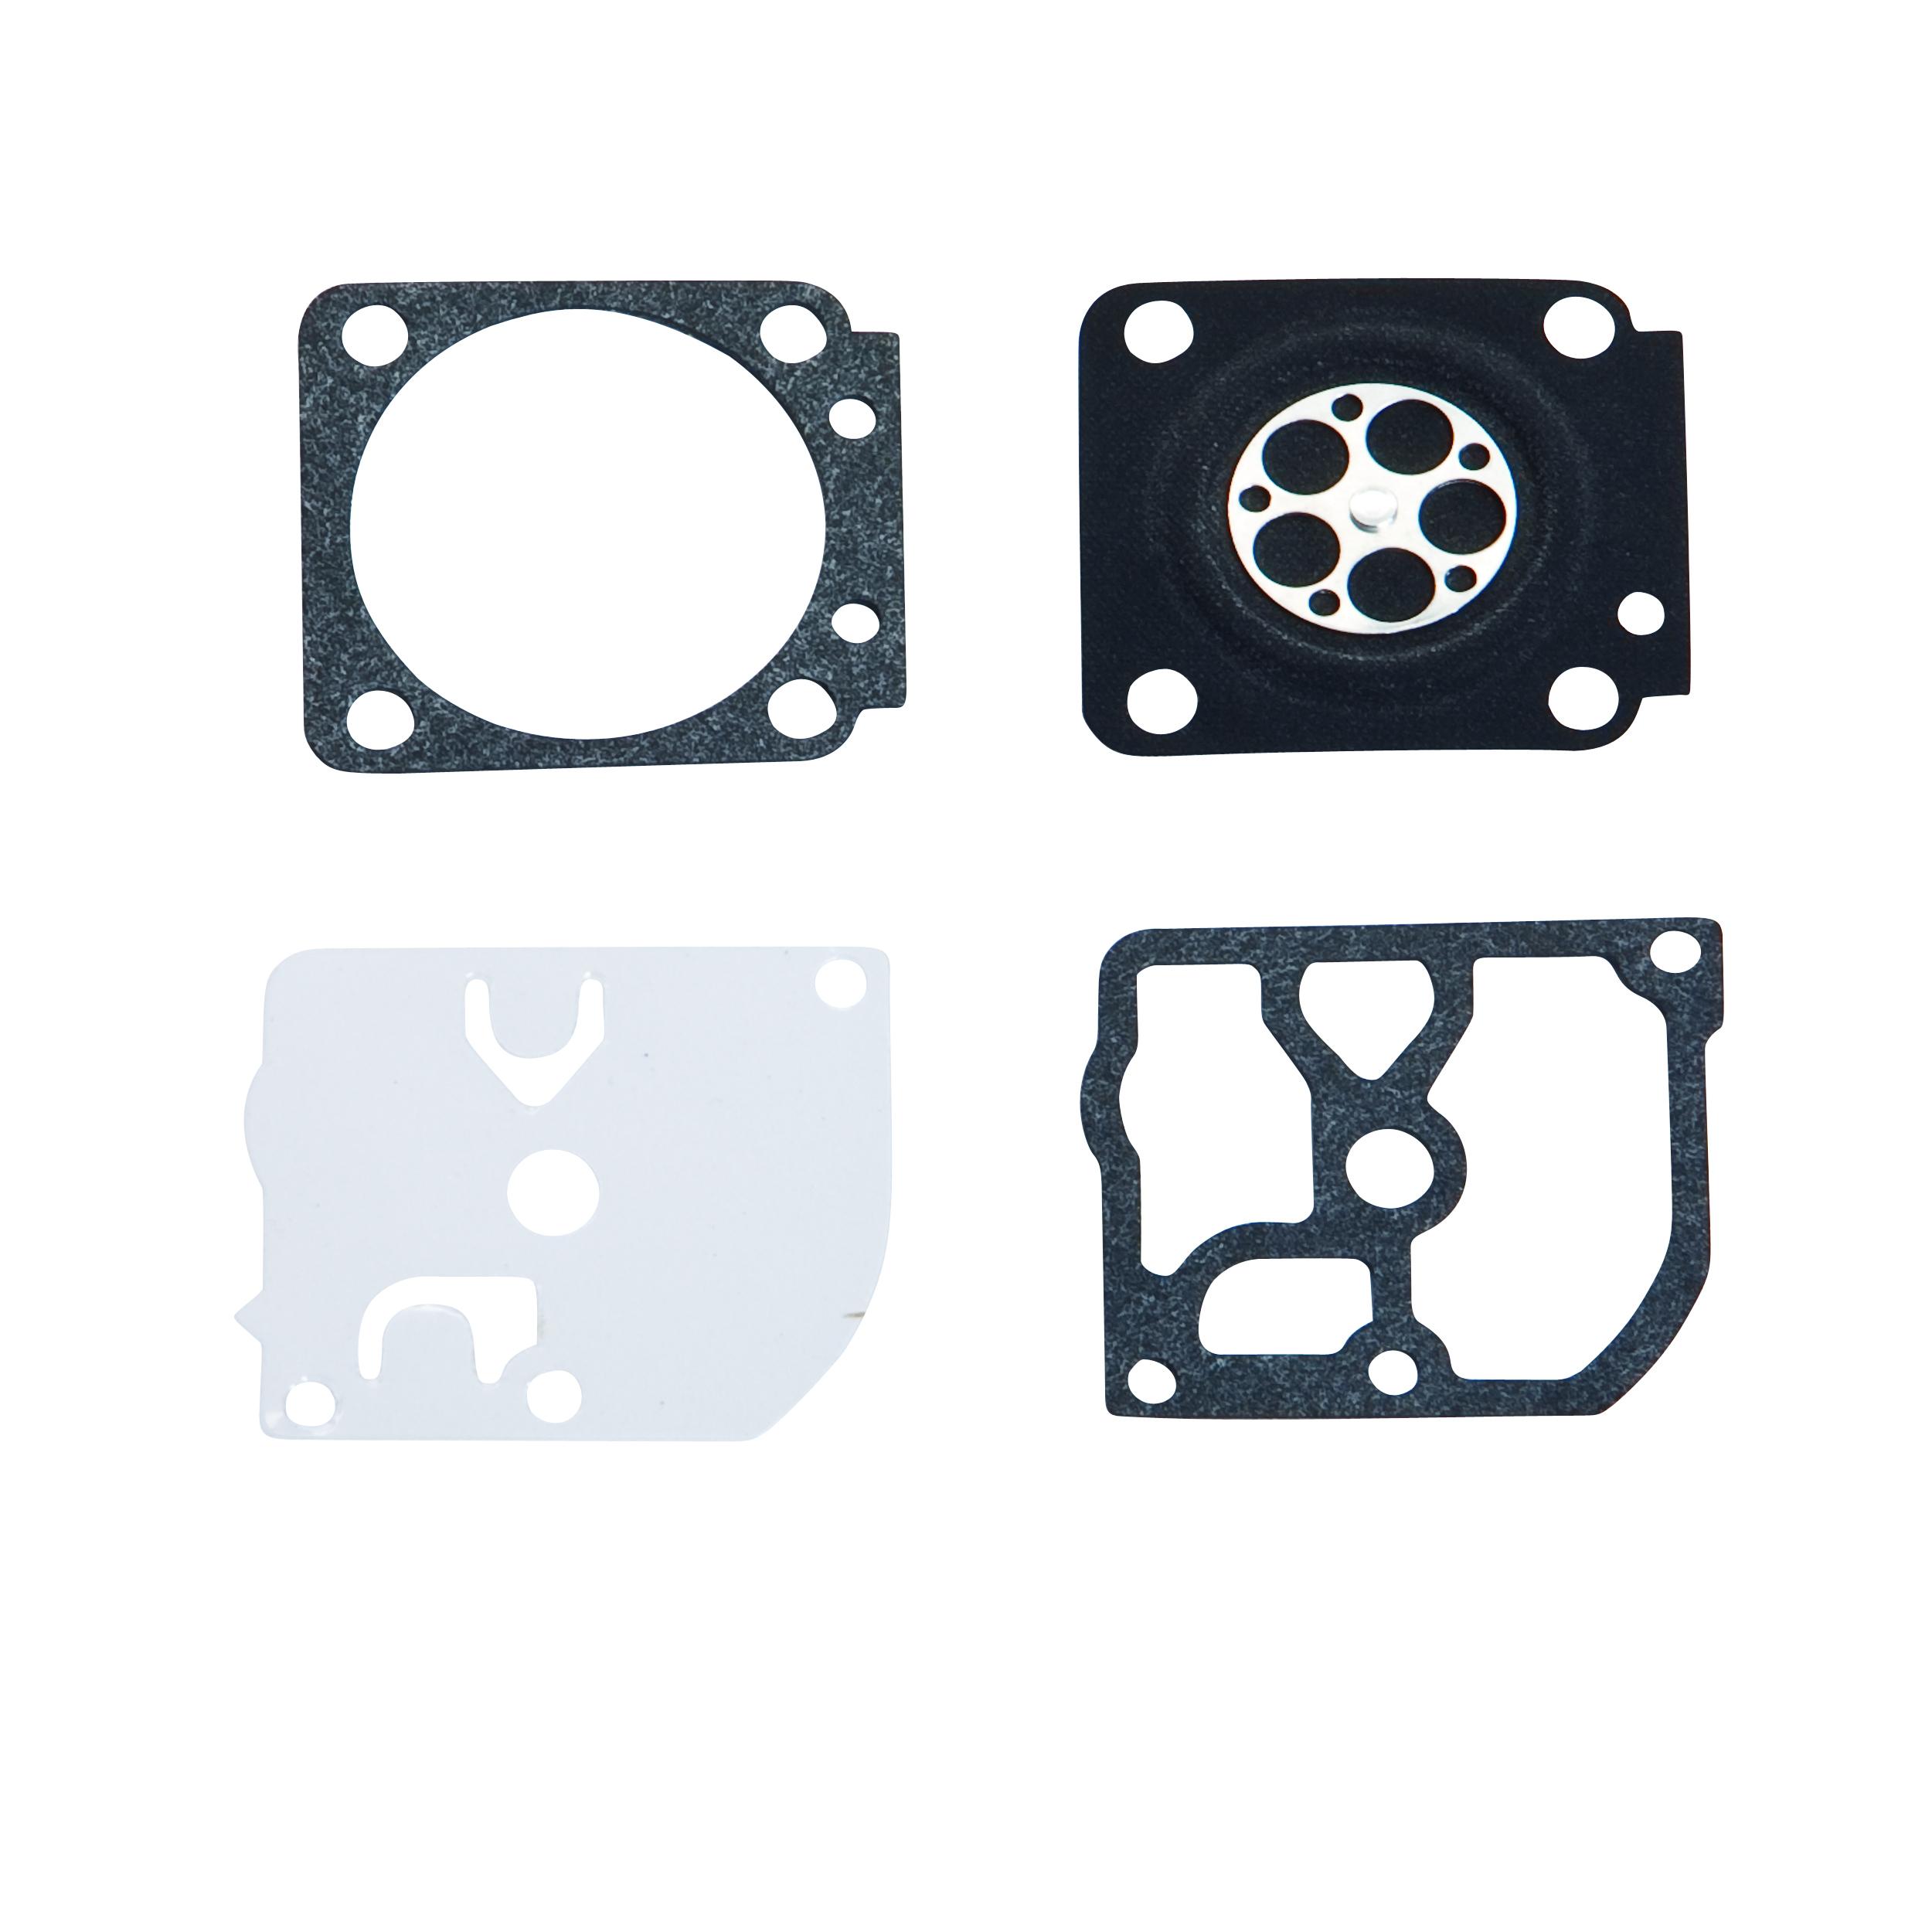 Oregon Carburetor Rebuild Kit for Zama A C1Q-S92,A C1Q-S102 /& A C1Q-S107 RB105